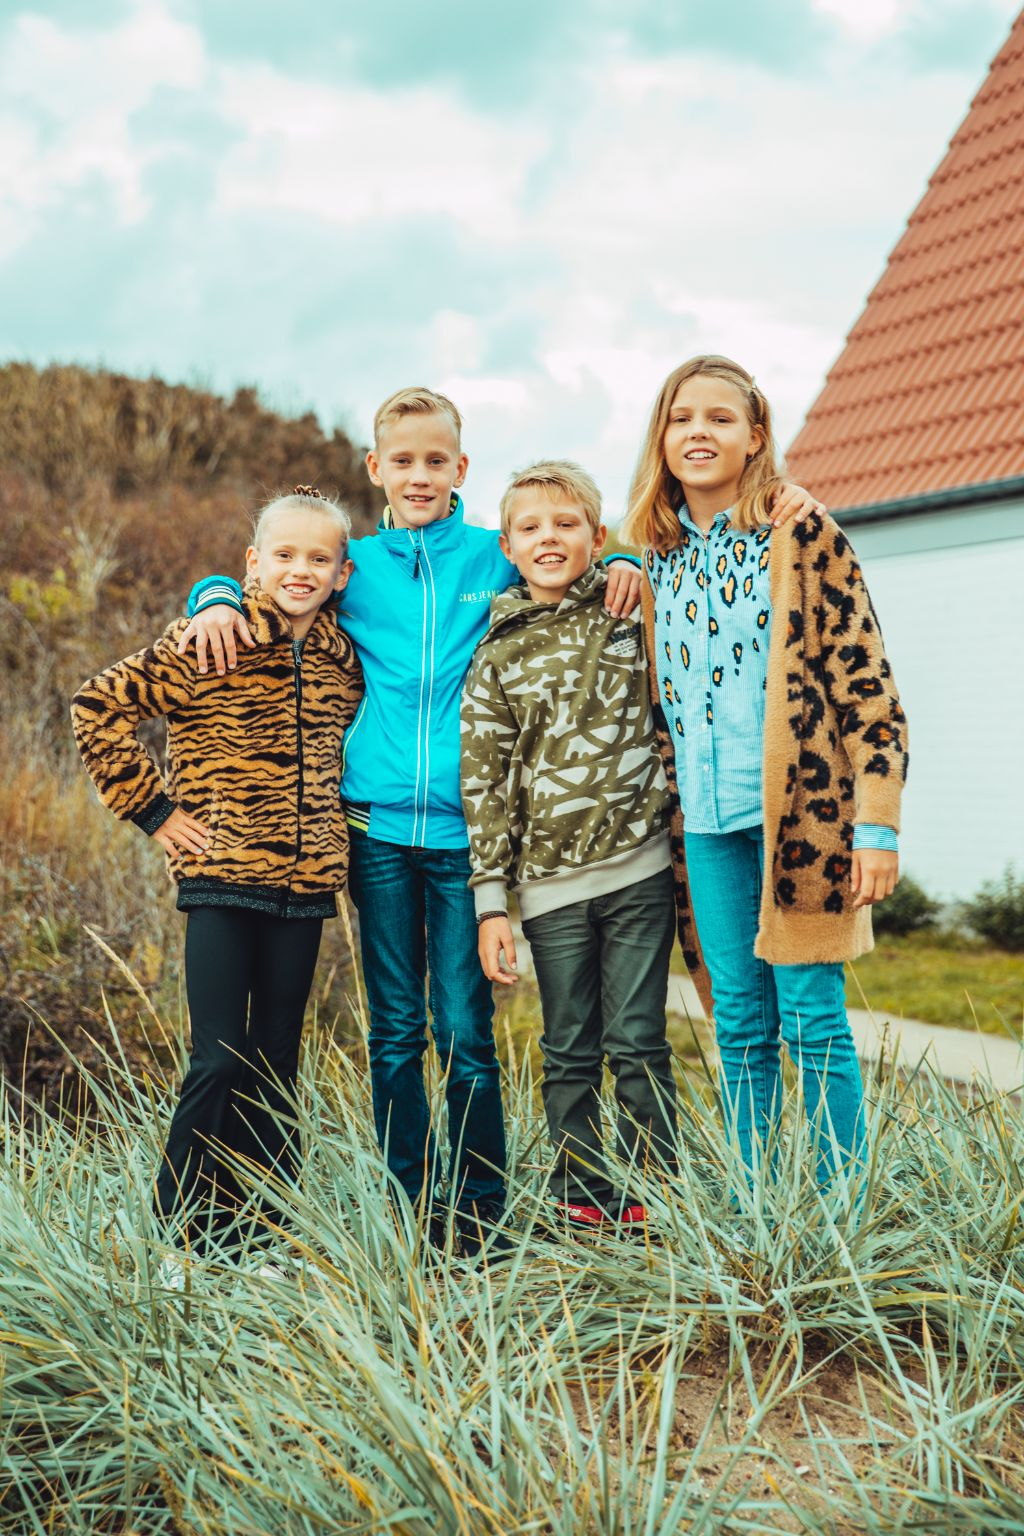 portfolio gezinsfotoshoots xifotgrafie